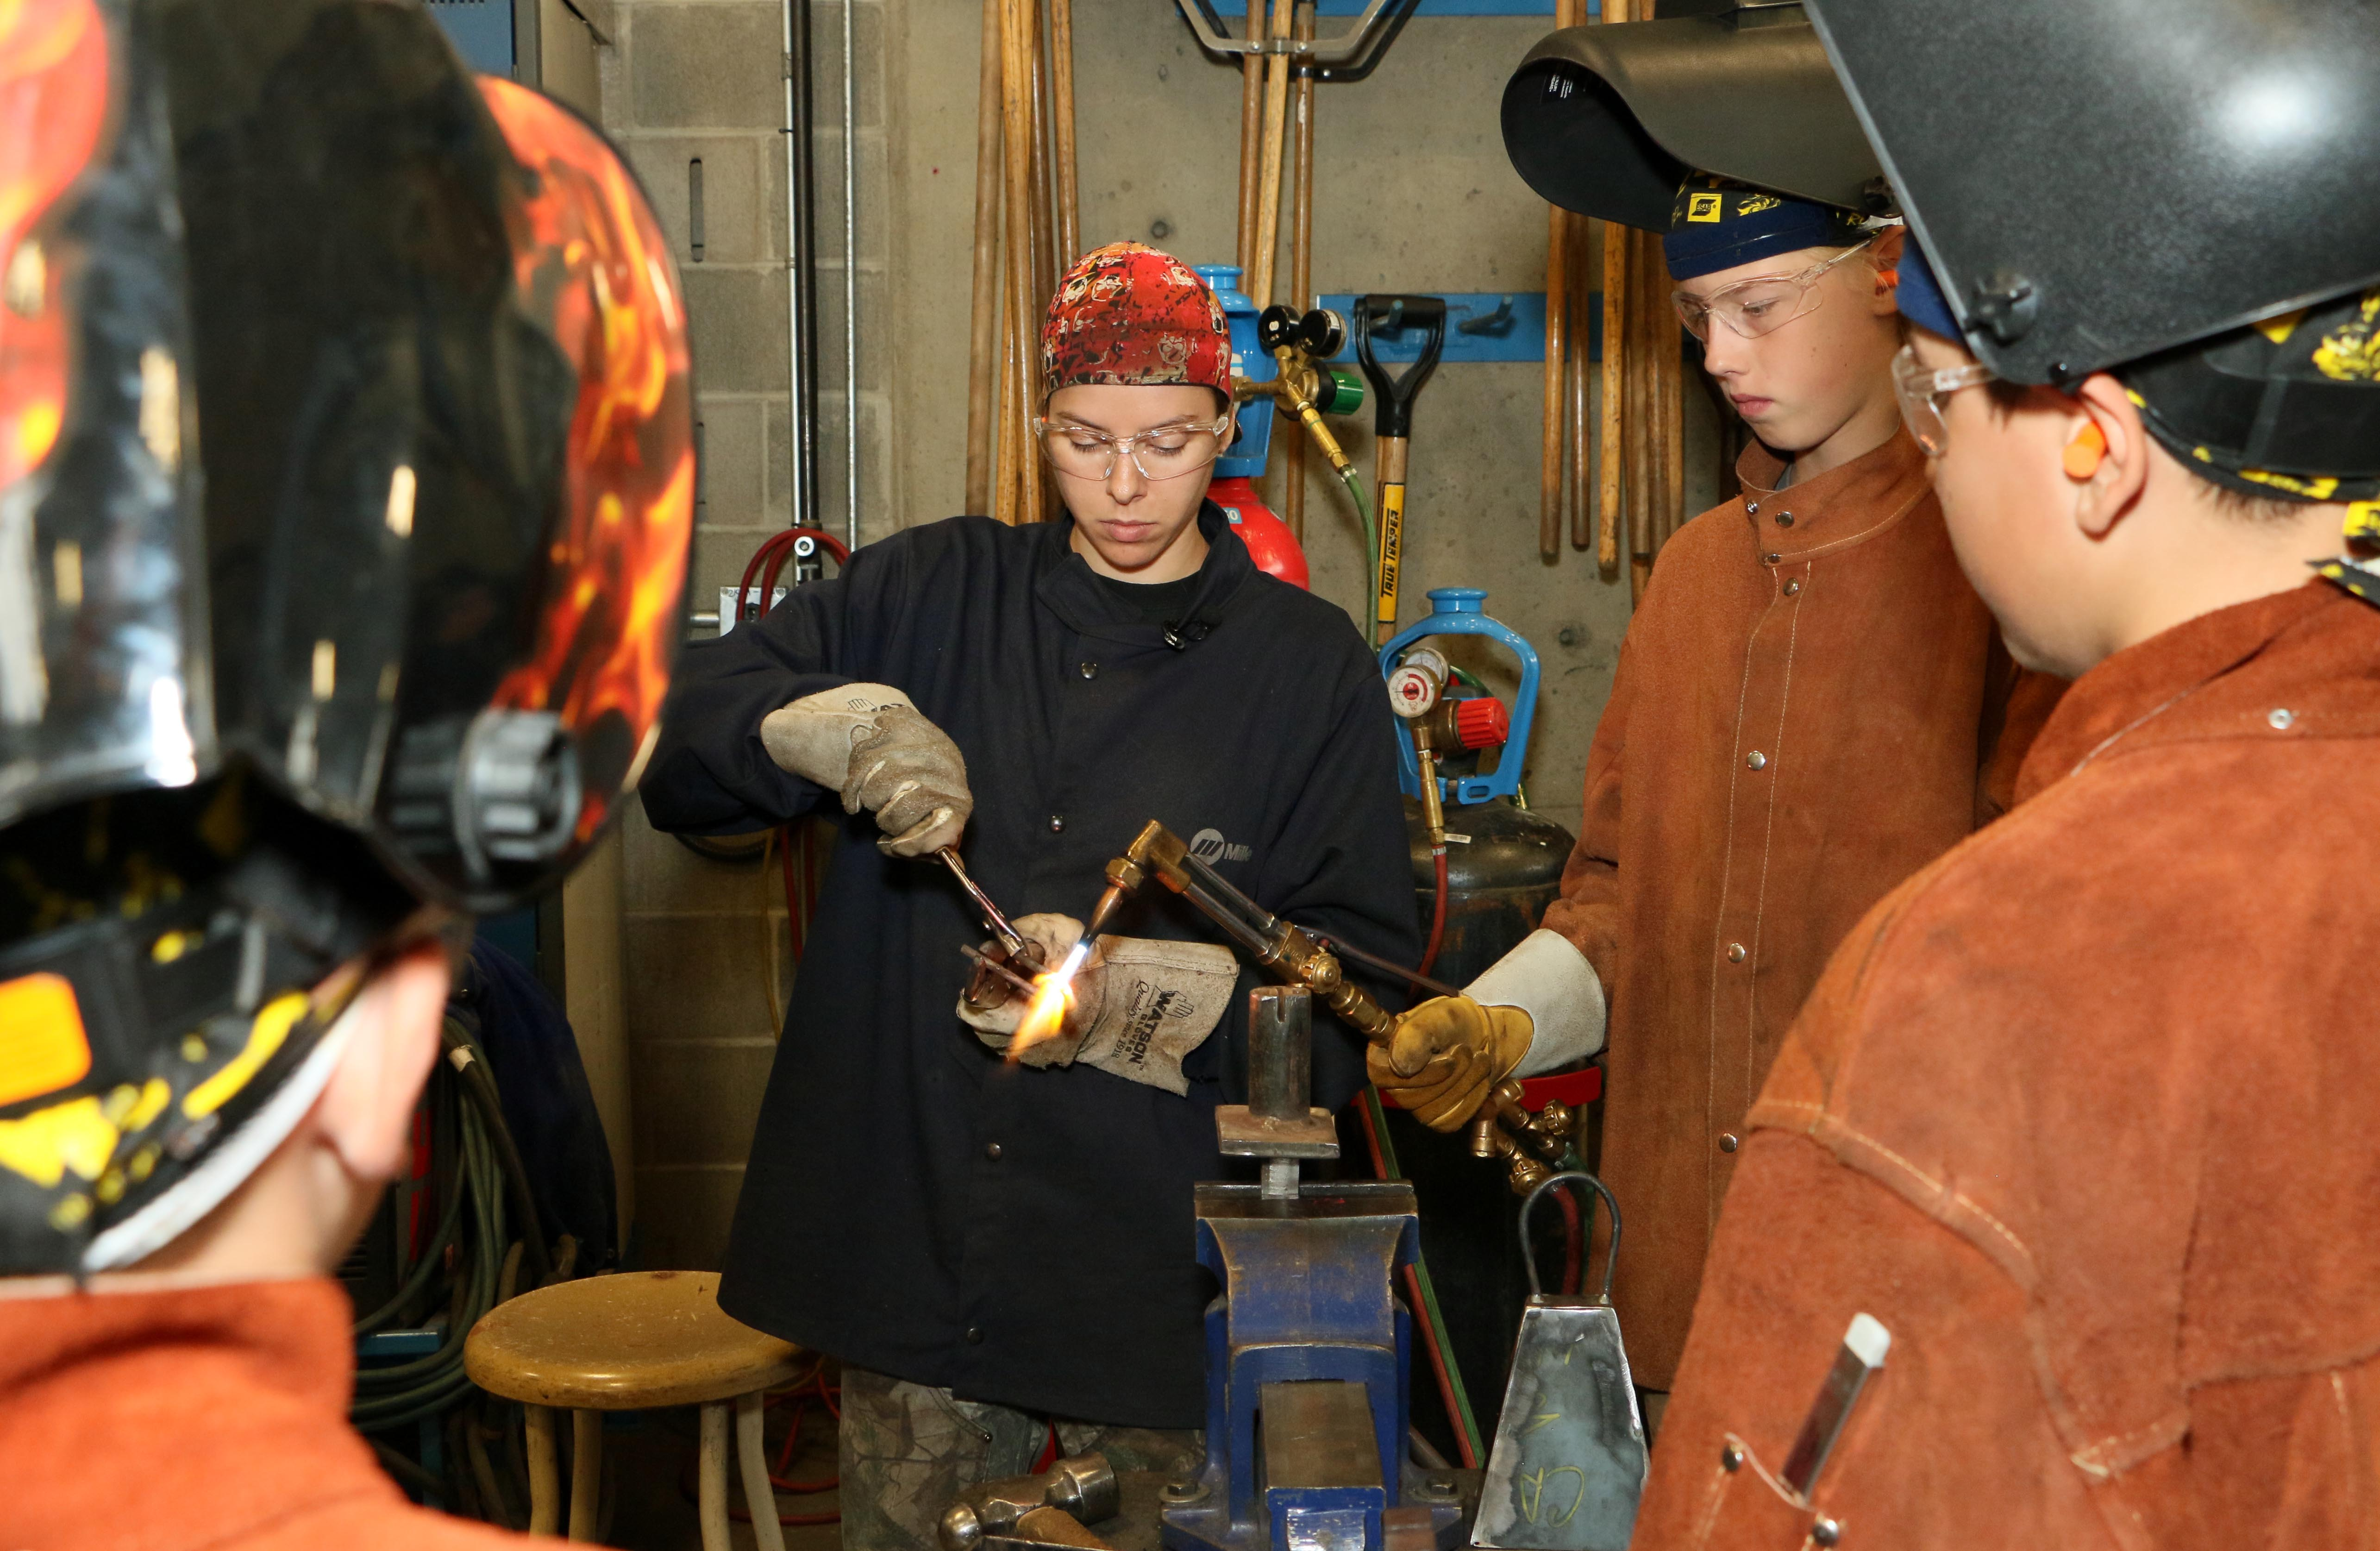 welding demonstration